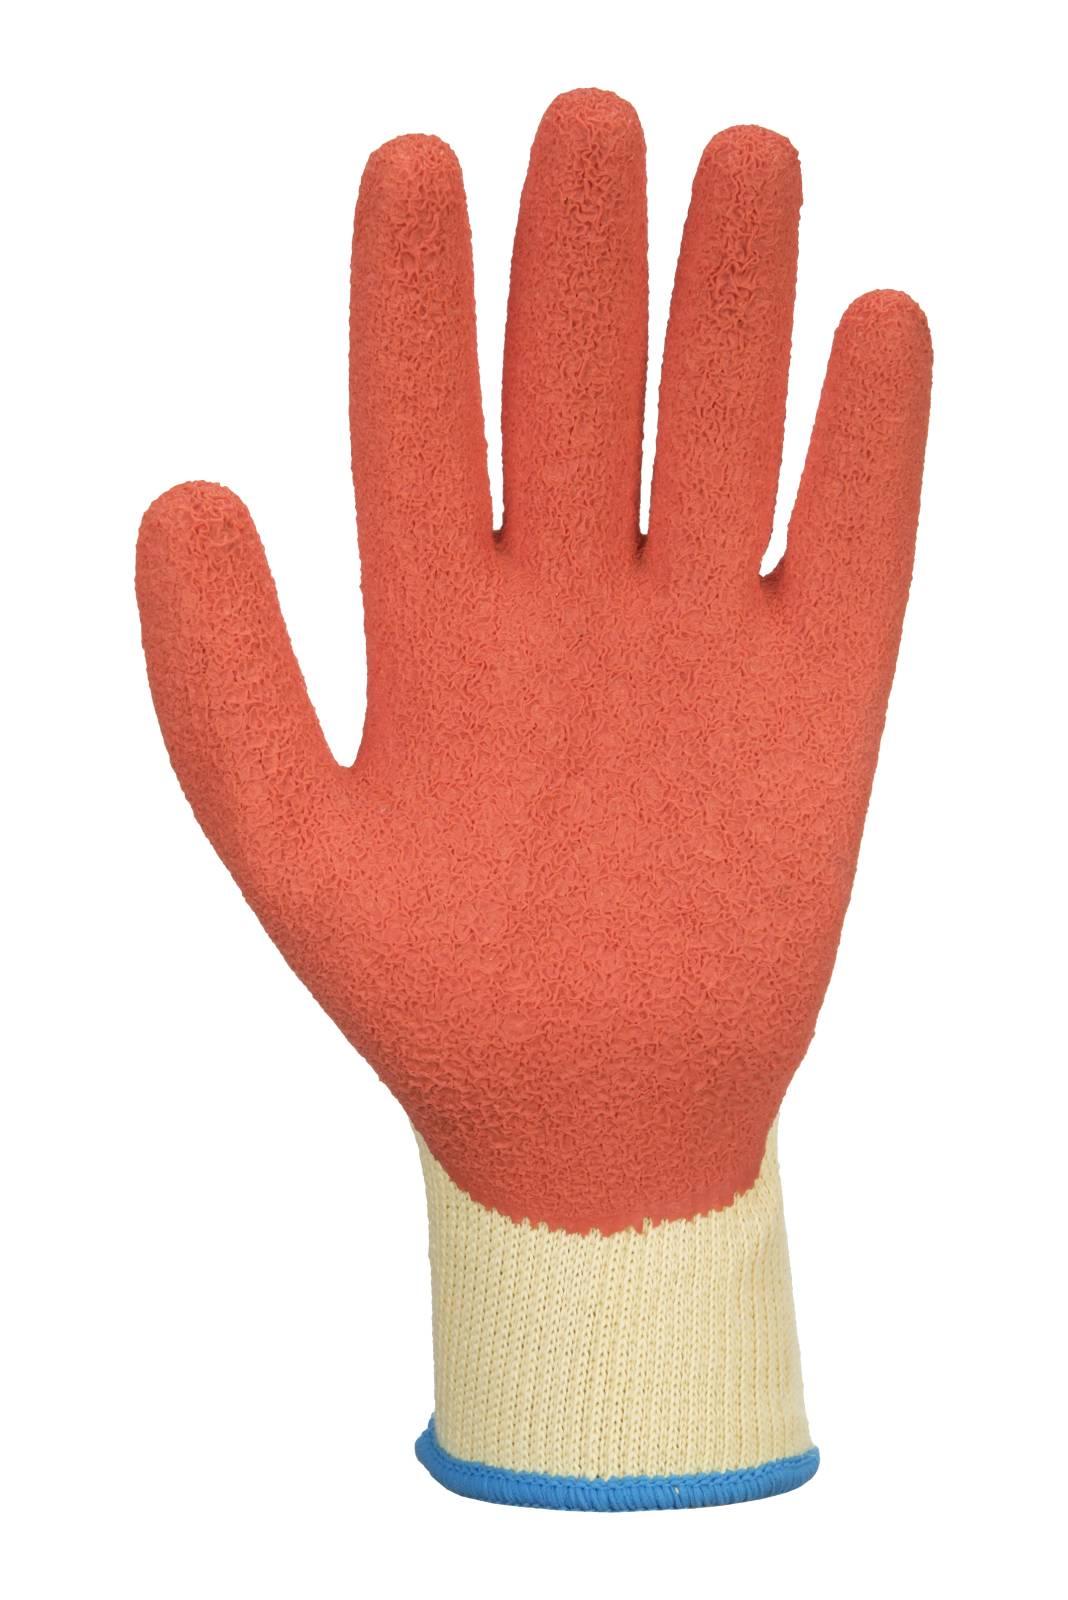 Portwest Handschoenen A105 geel-oranje(Y1)